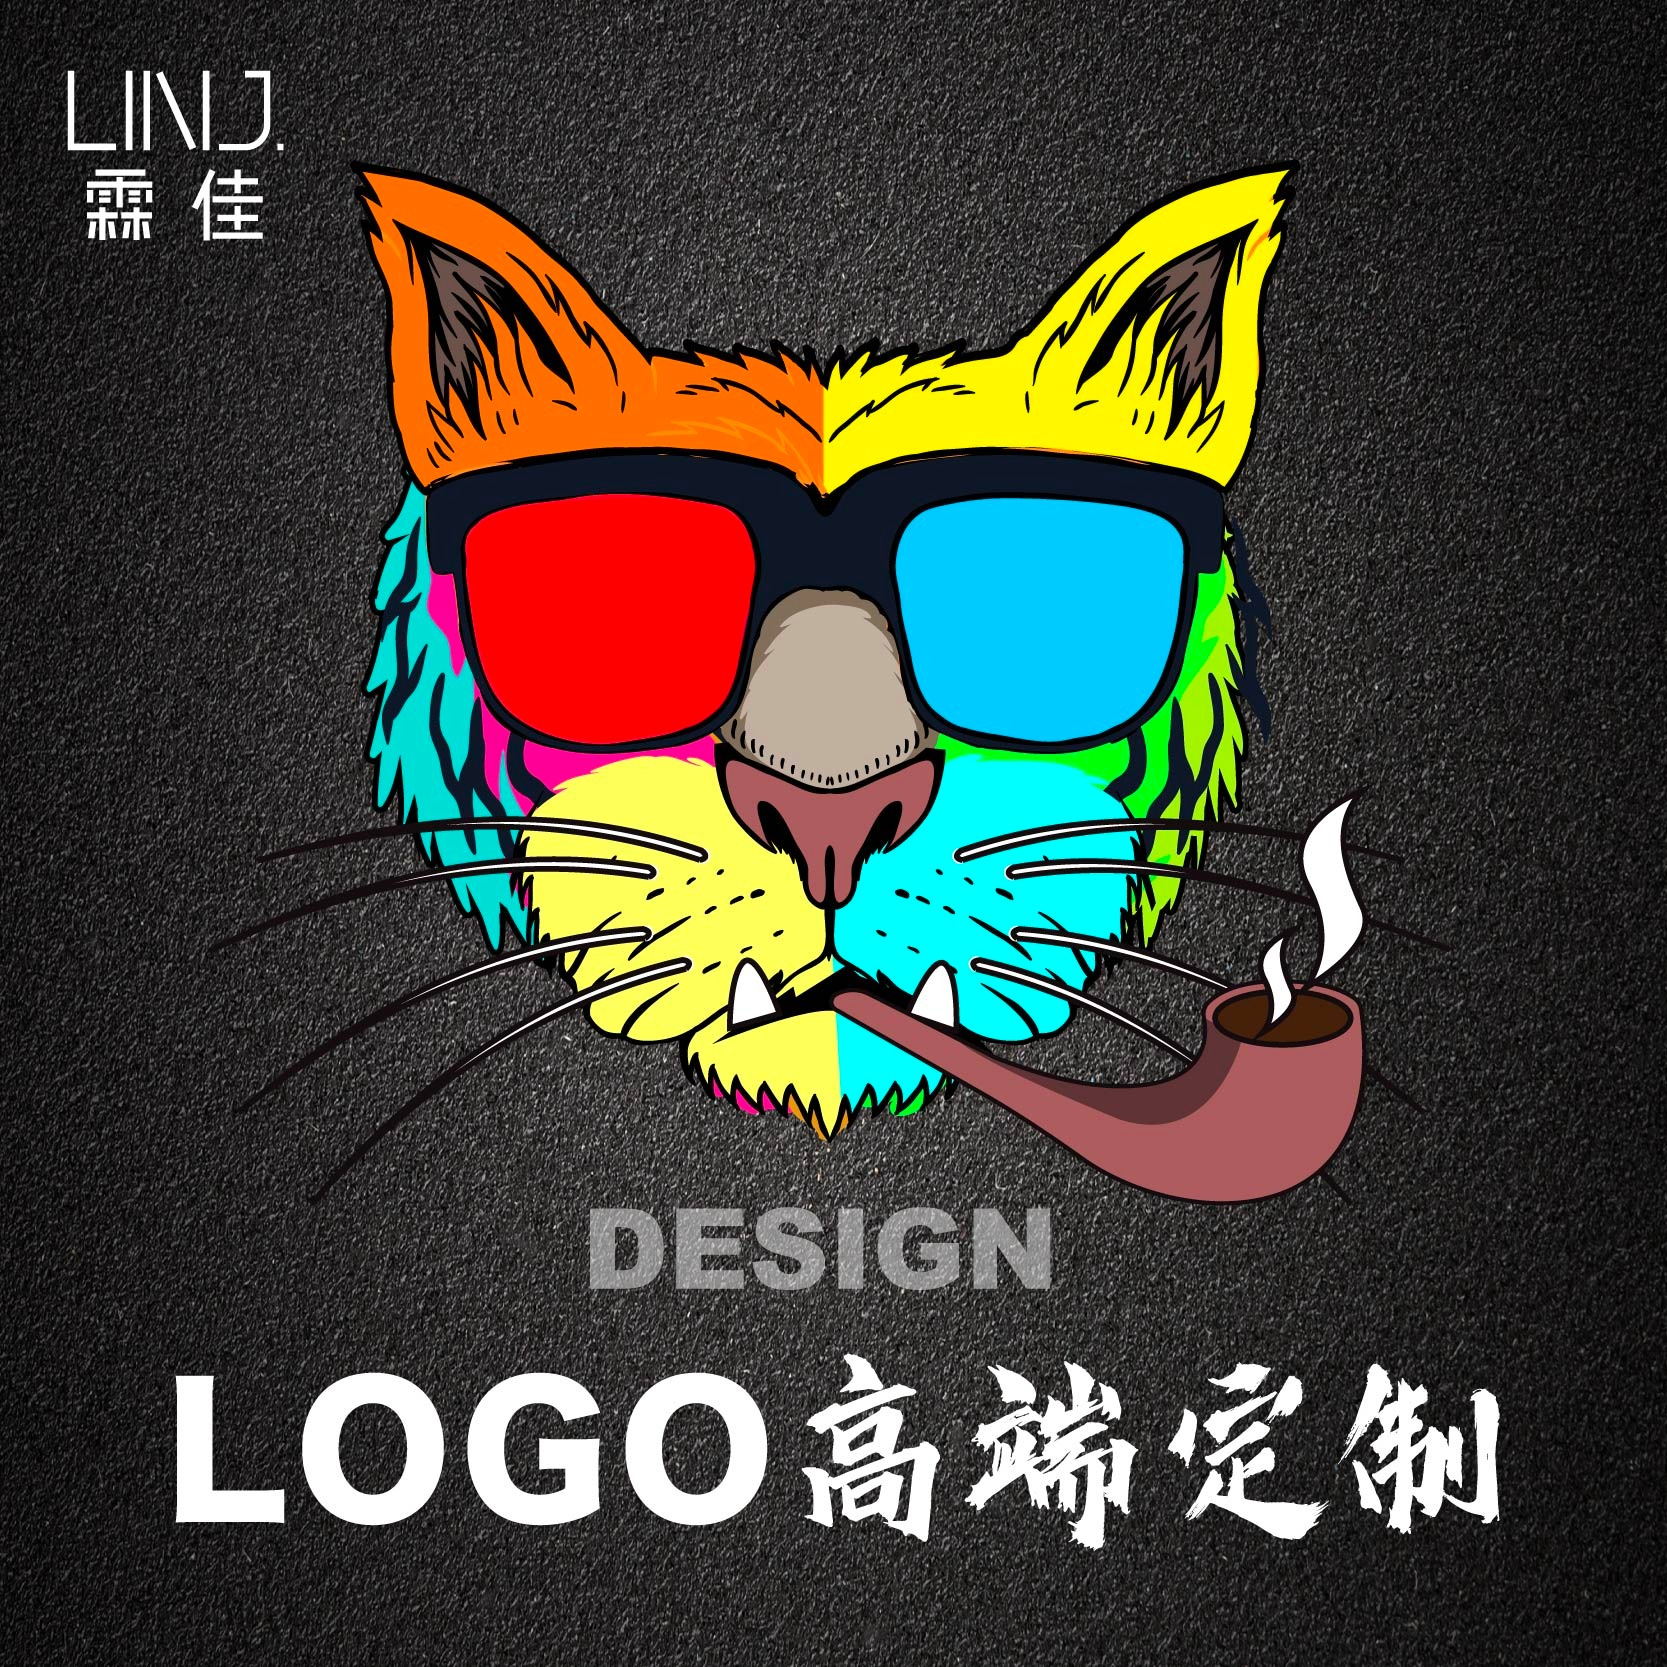 【LOGO高端定制】企业公司/公众号/标识/个人LOGO设计